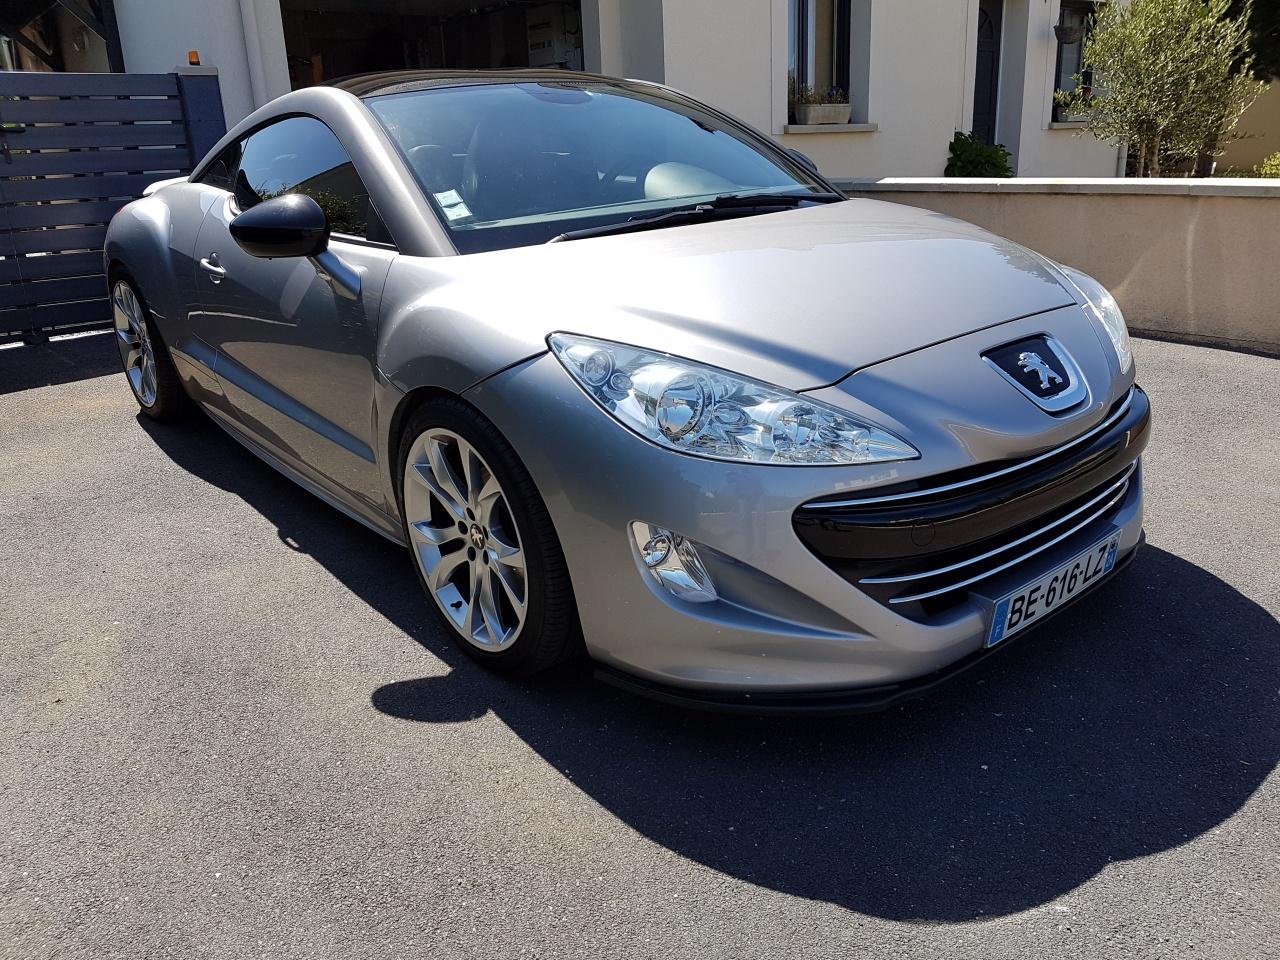 [f5sxd] Laguna III.2 Coupé 150cv Monaco Gp 36992520160812131301